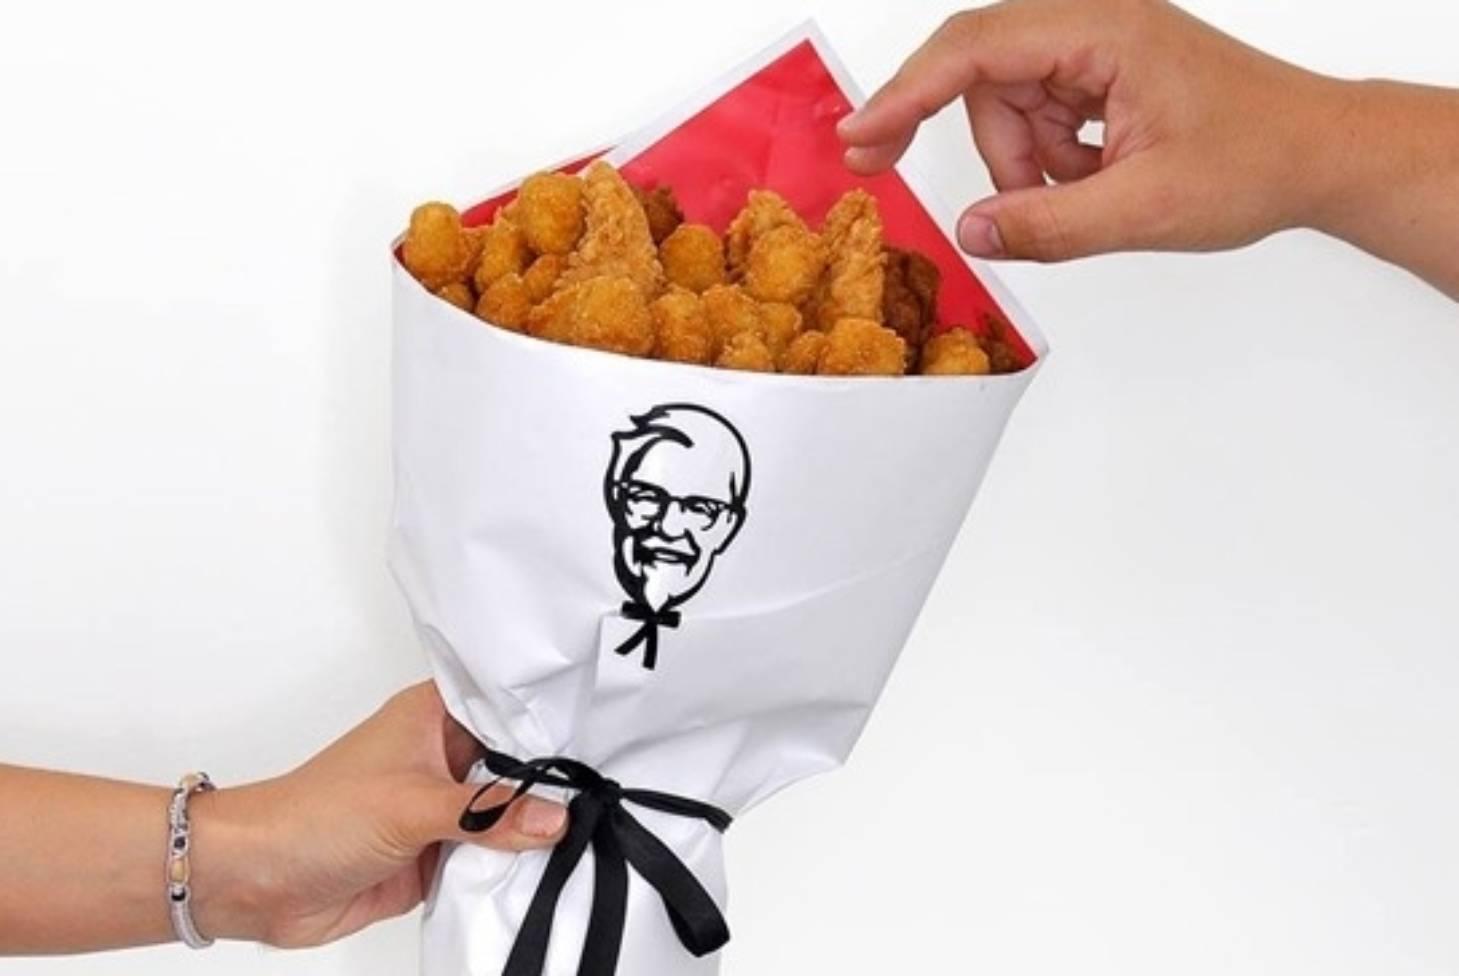 KFC\'s novel Valentine\'s Day gift: A bouquet of deep fried chicken ...